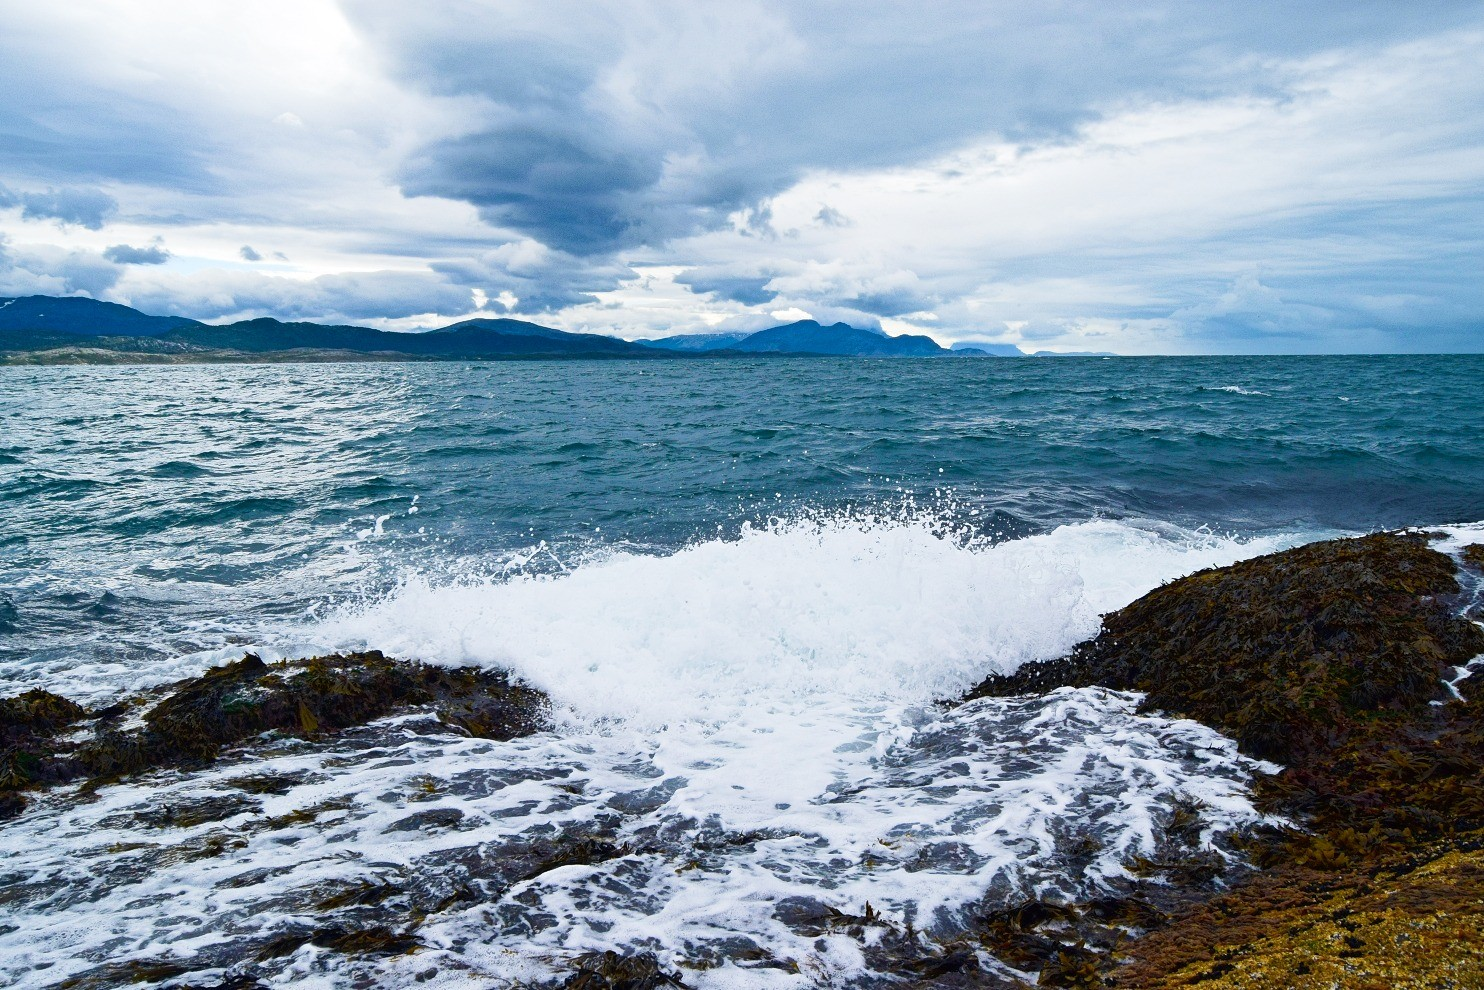 Bølger og brus i fjæra